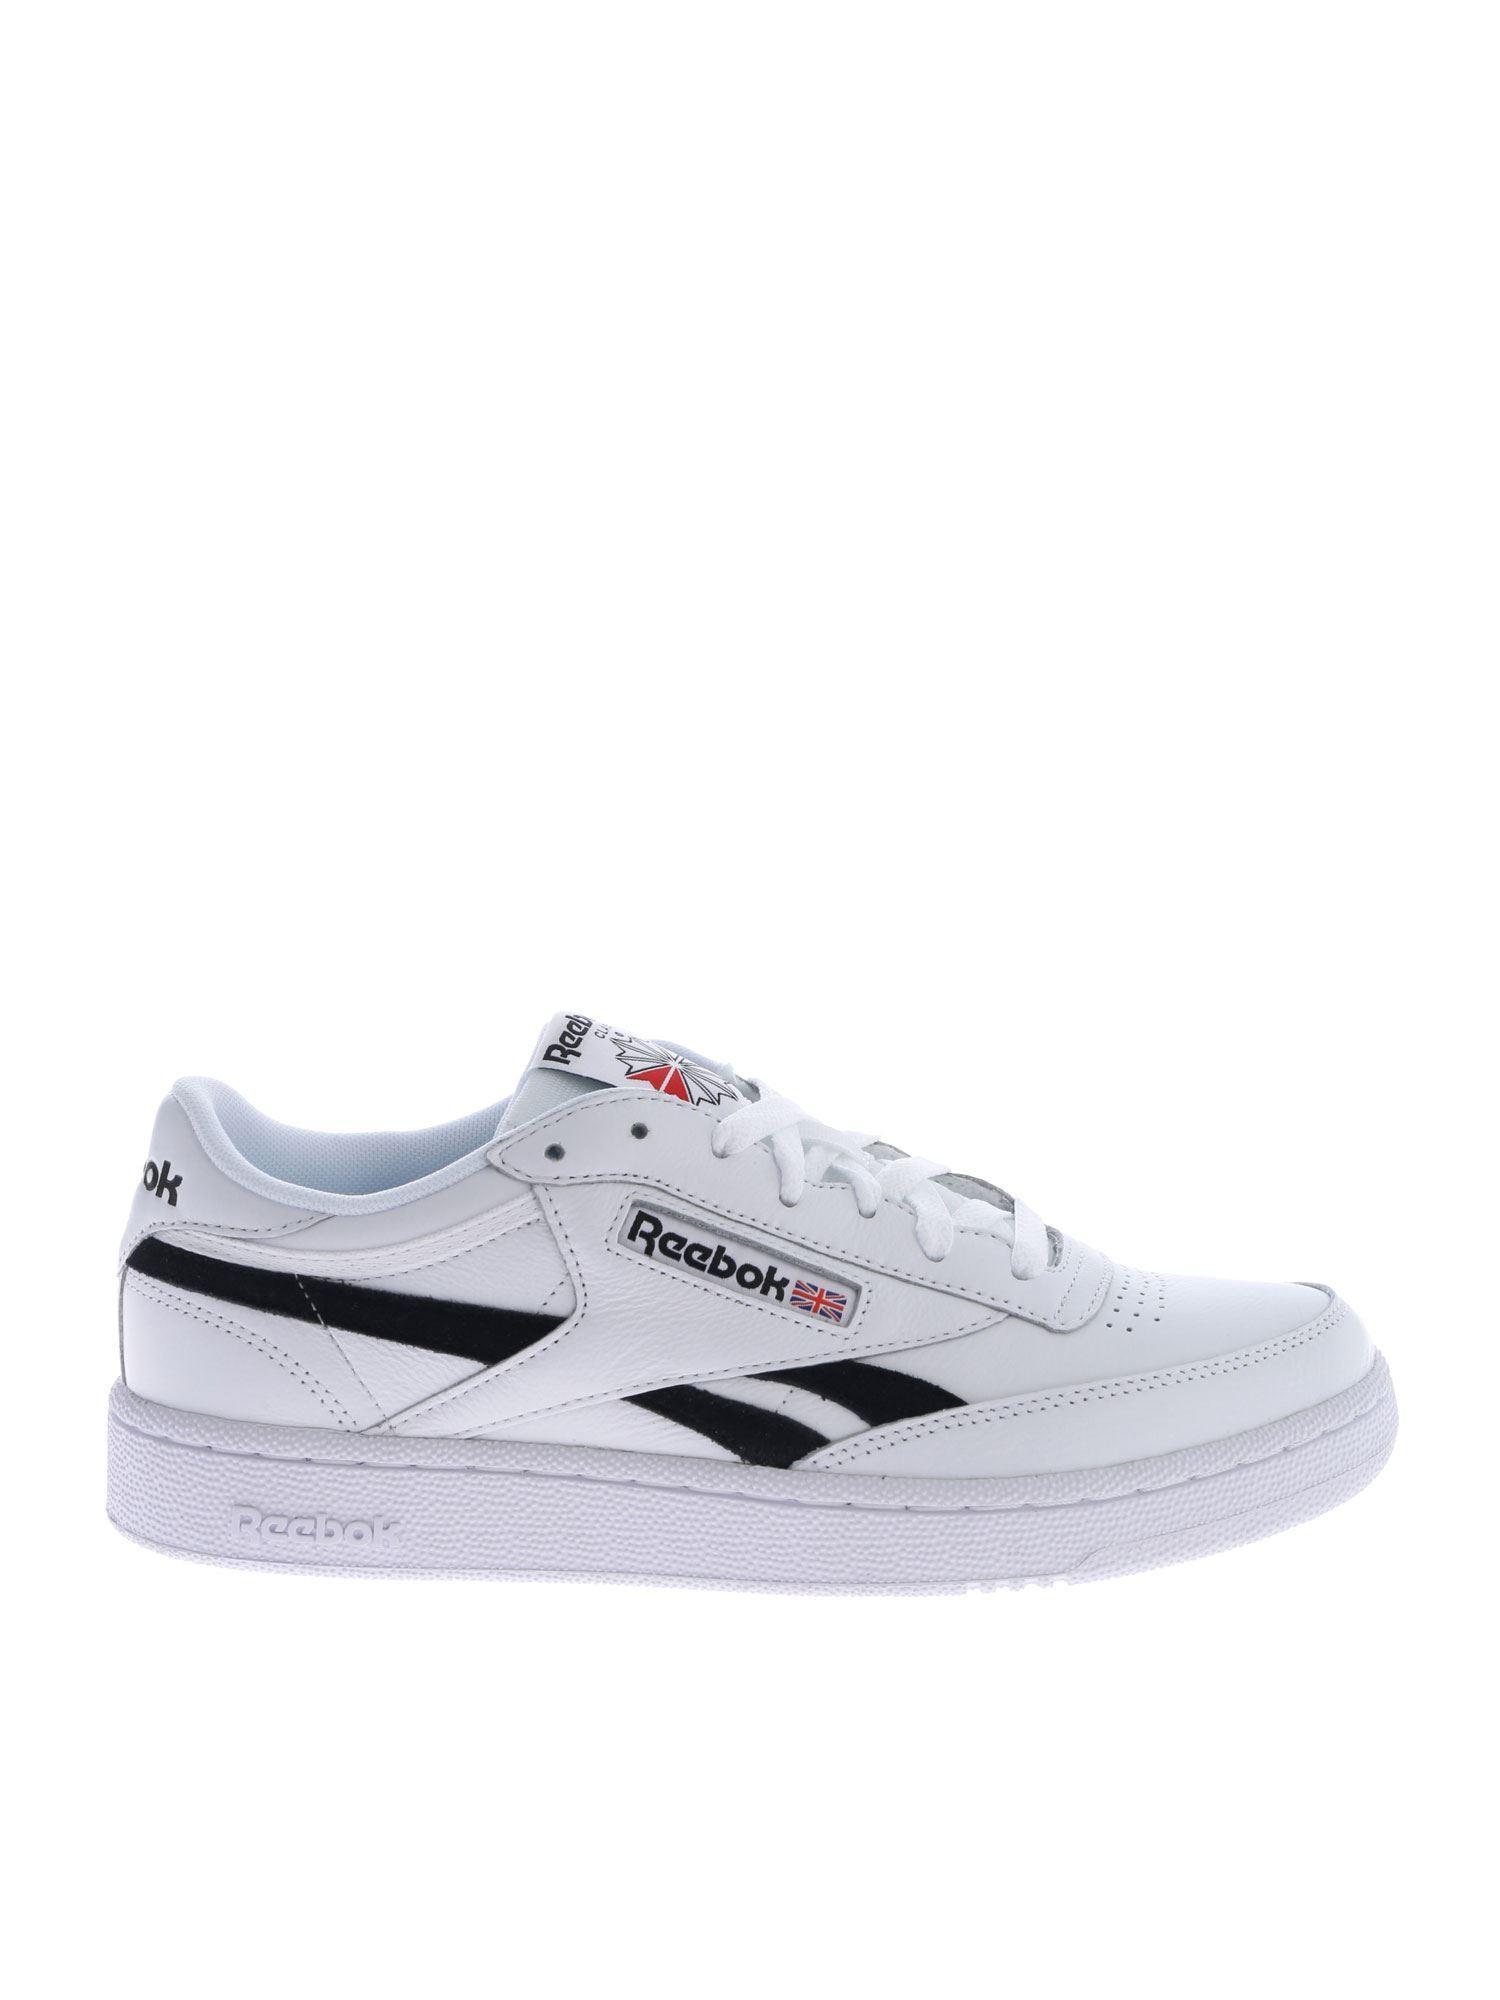 4a7e60e99d Lyst - Reebok Revenge Plus Mu Sneakers In White And Black in White ...